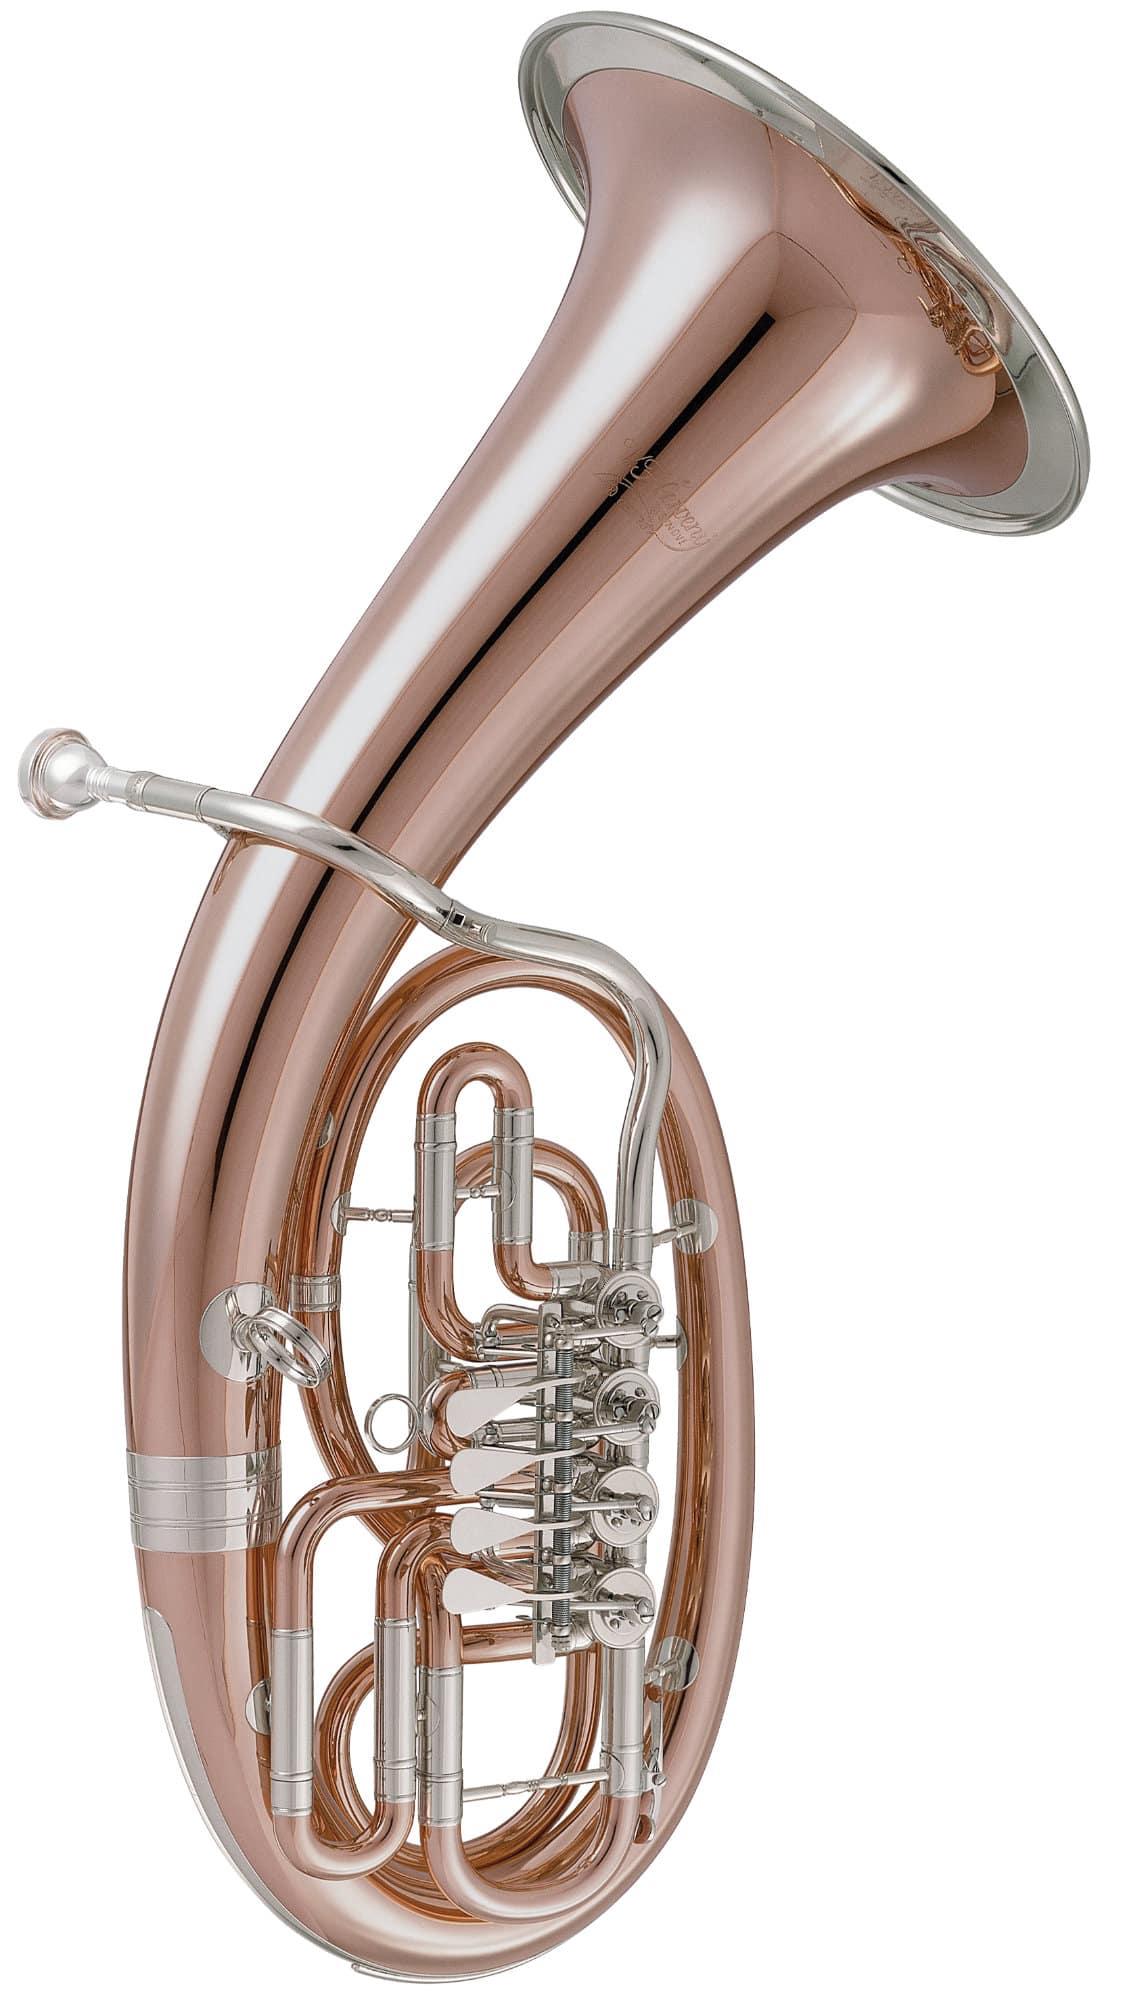 Baritone - Cerveny CVEP 741 4R Bariton - Onlineshop Musikhaus Kirstein